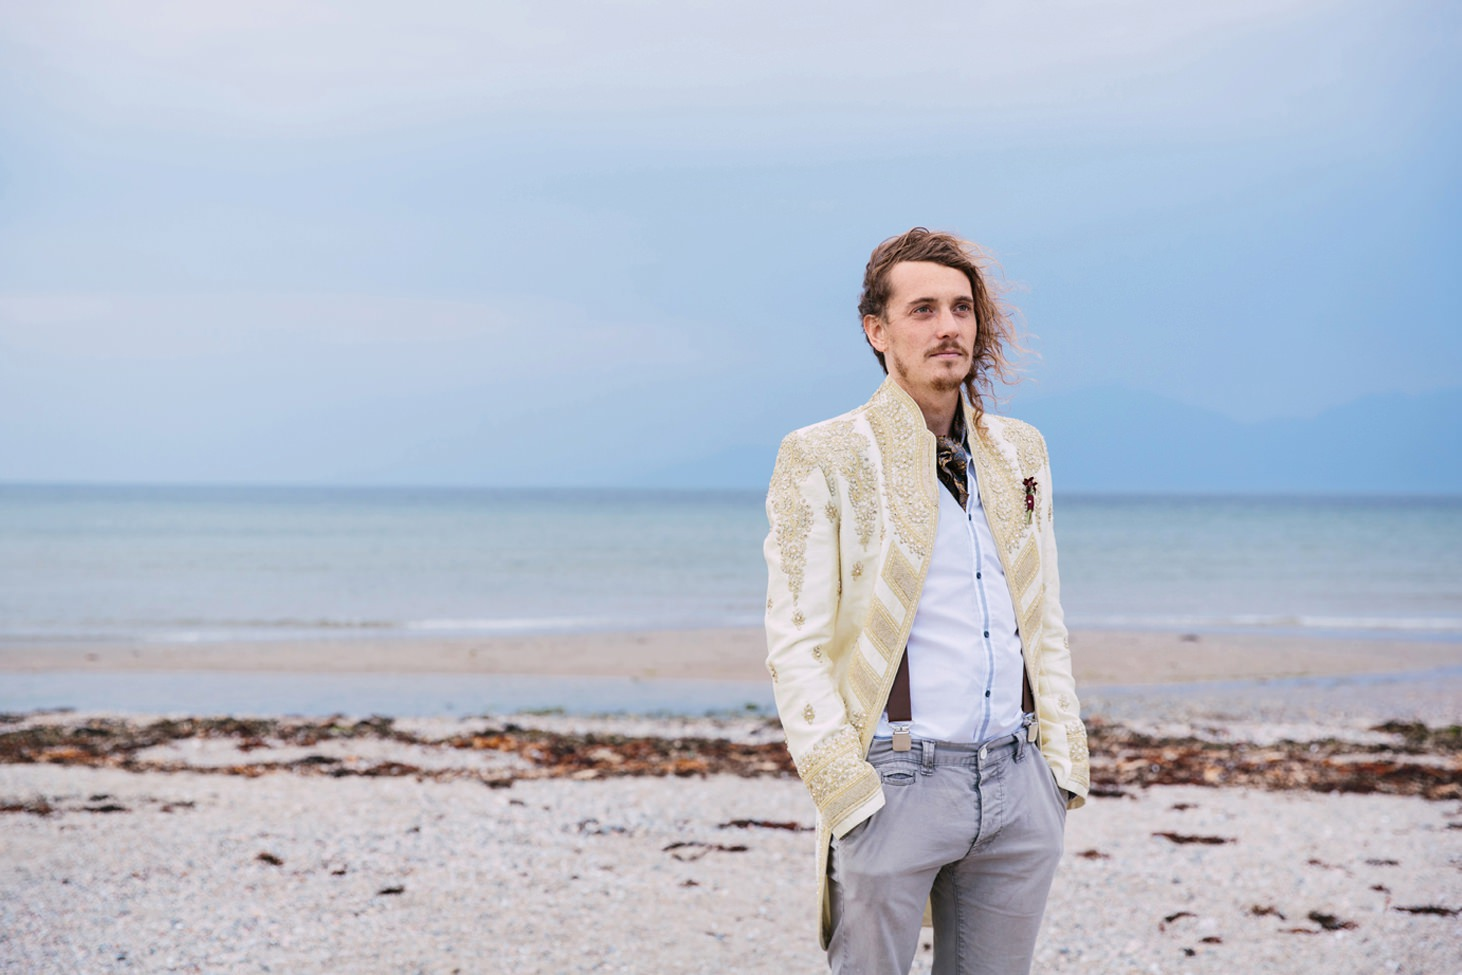 sle of bute wedding photography groom on beach